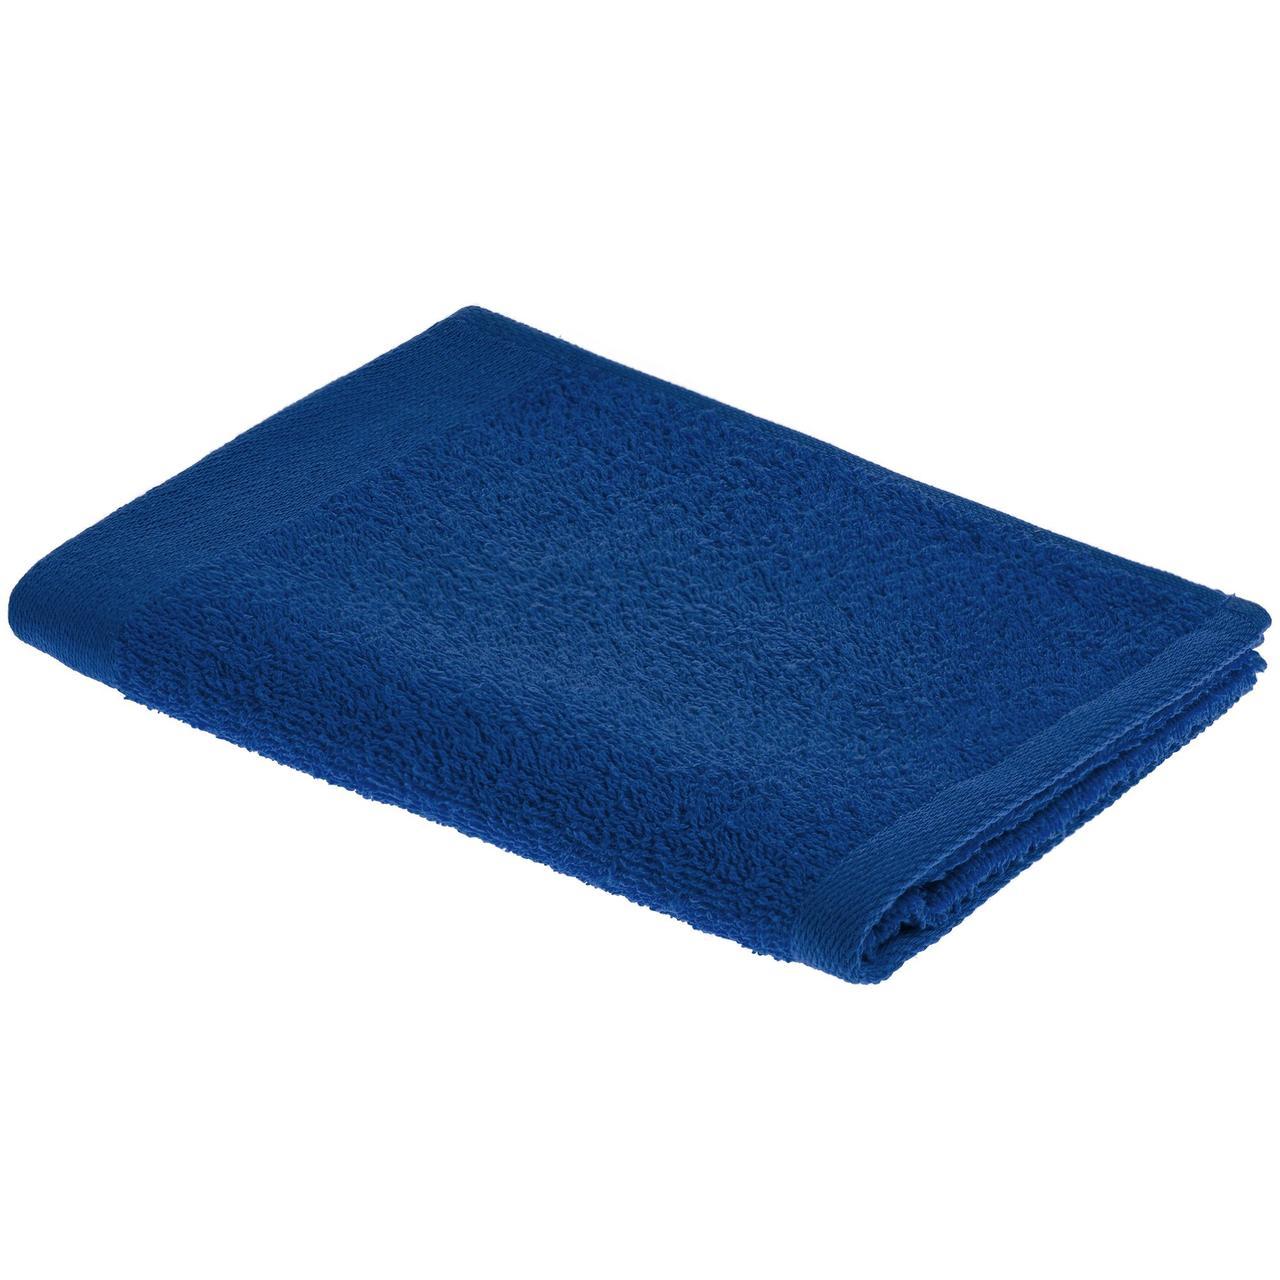 Полотенце Soft Me Light, малое, синее (артикул 15116.40)